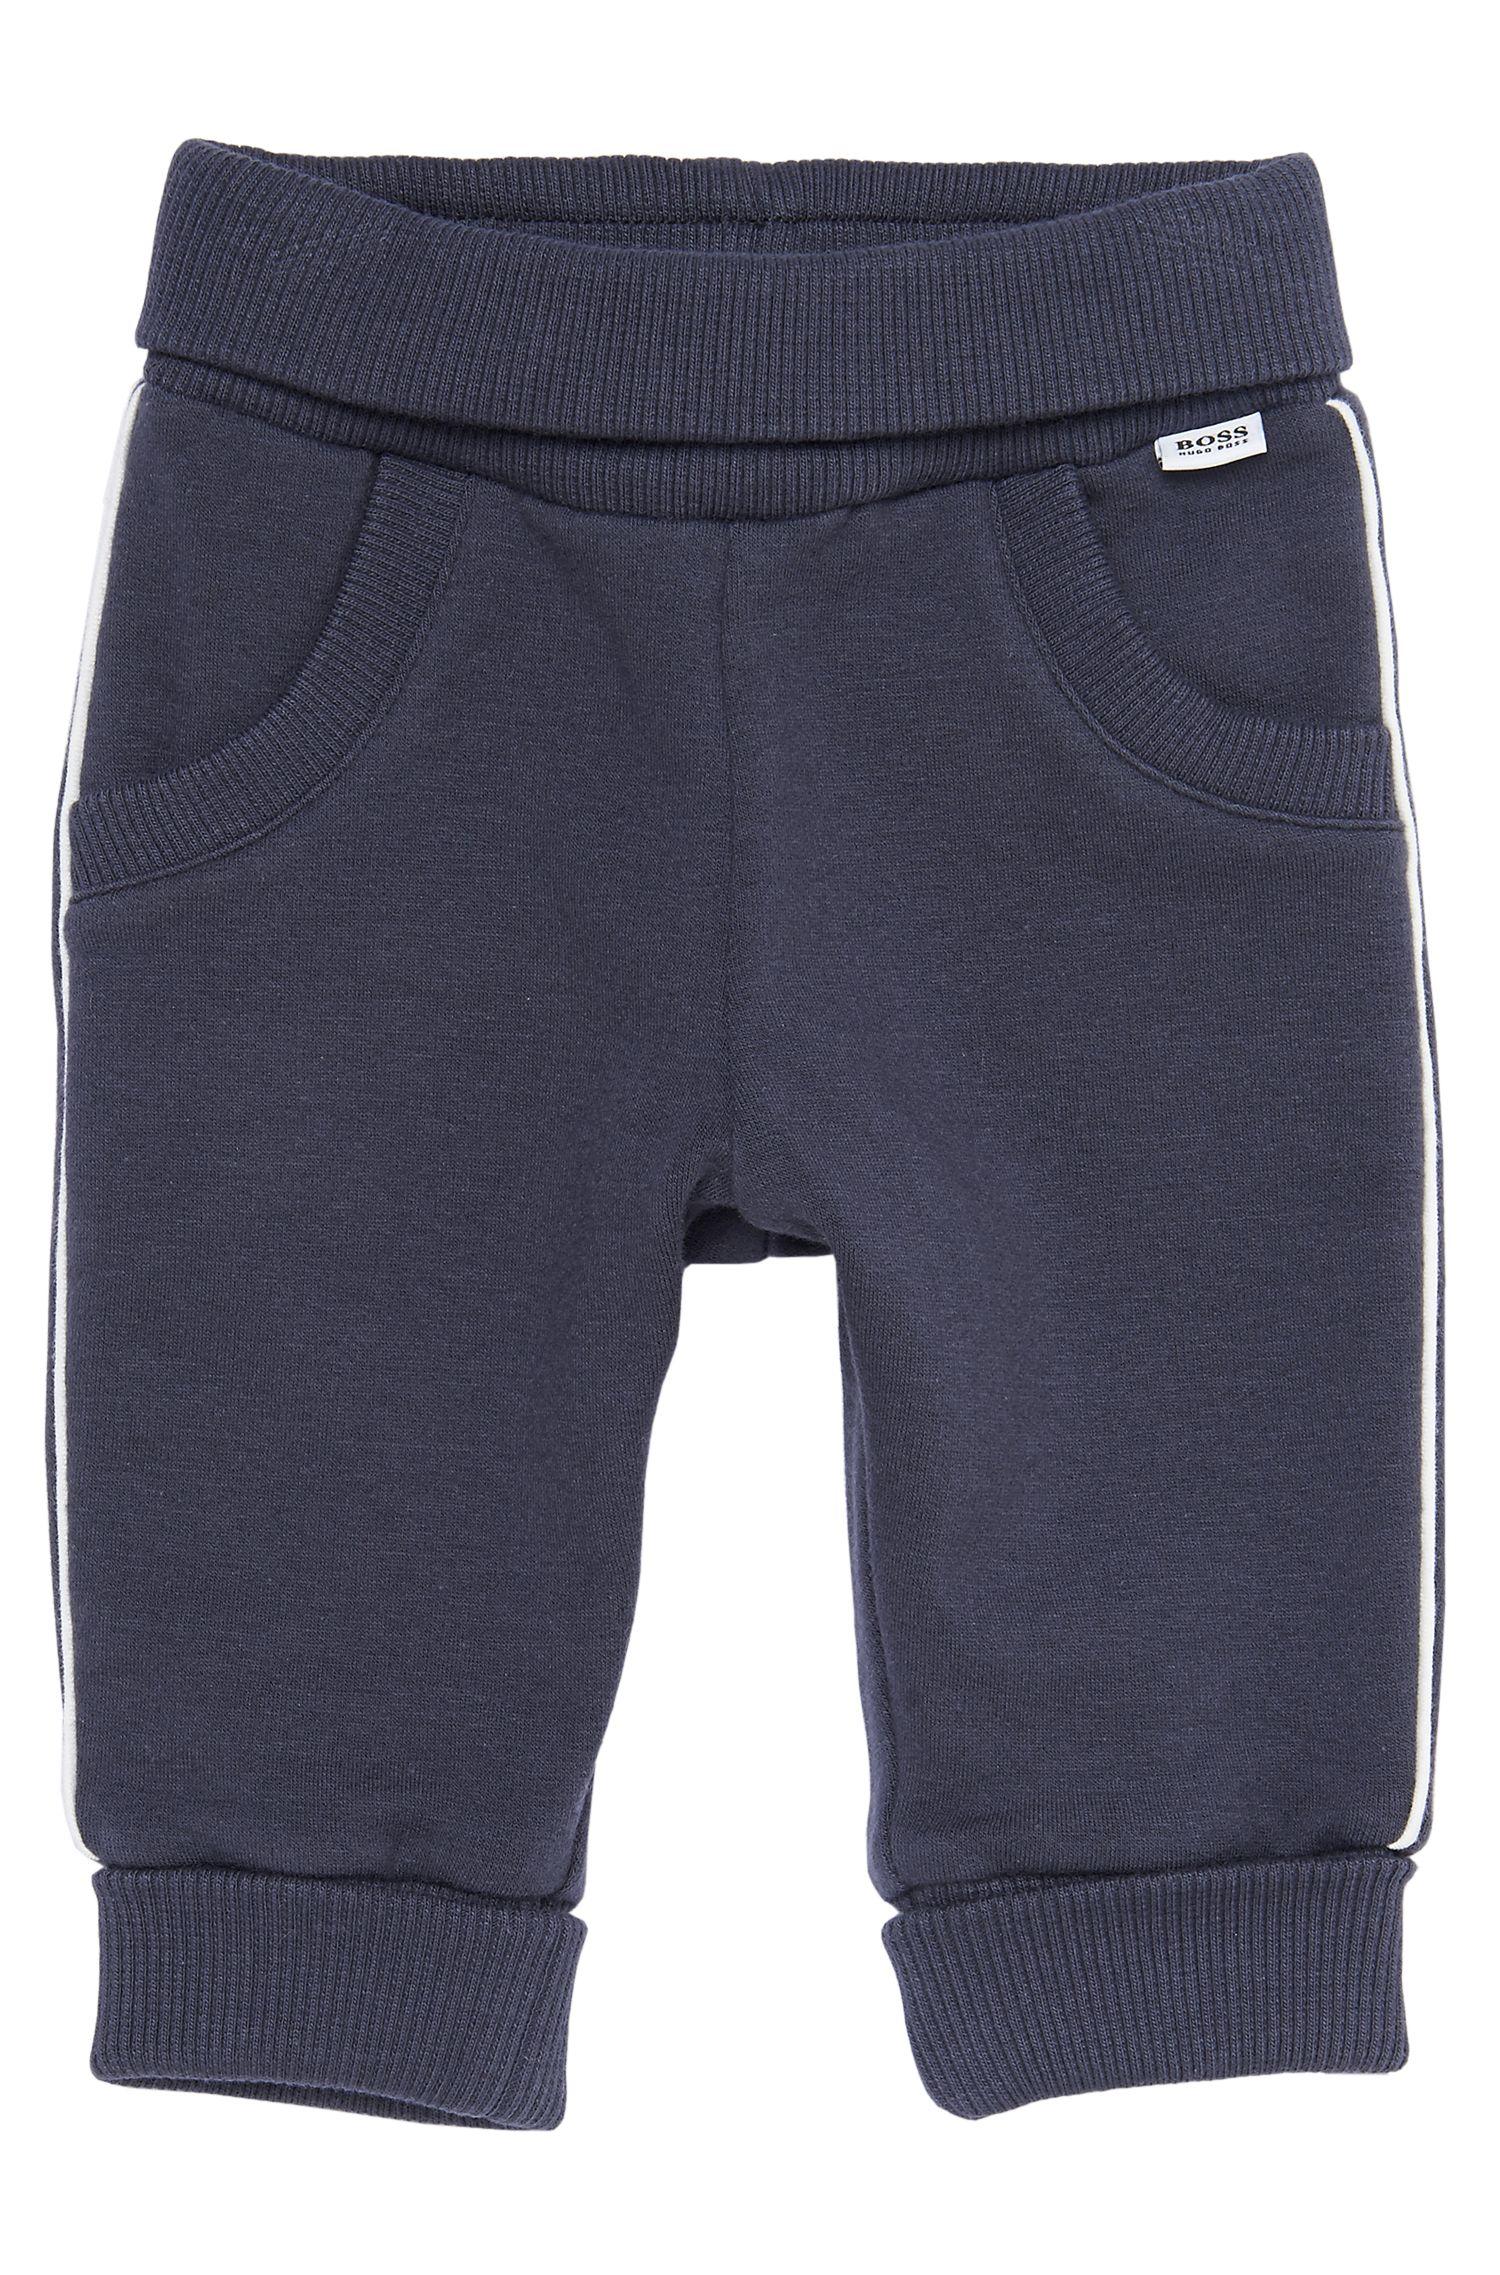 'J94073' | Infant Stretch Fleece Pants